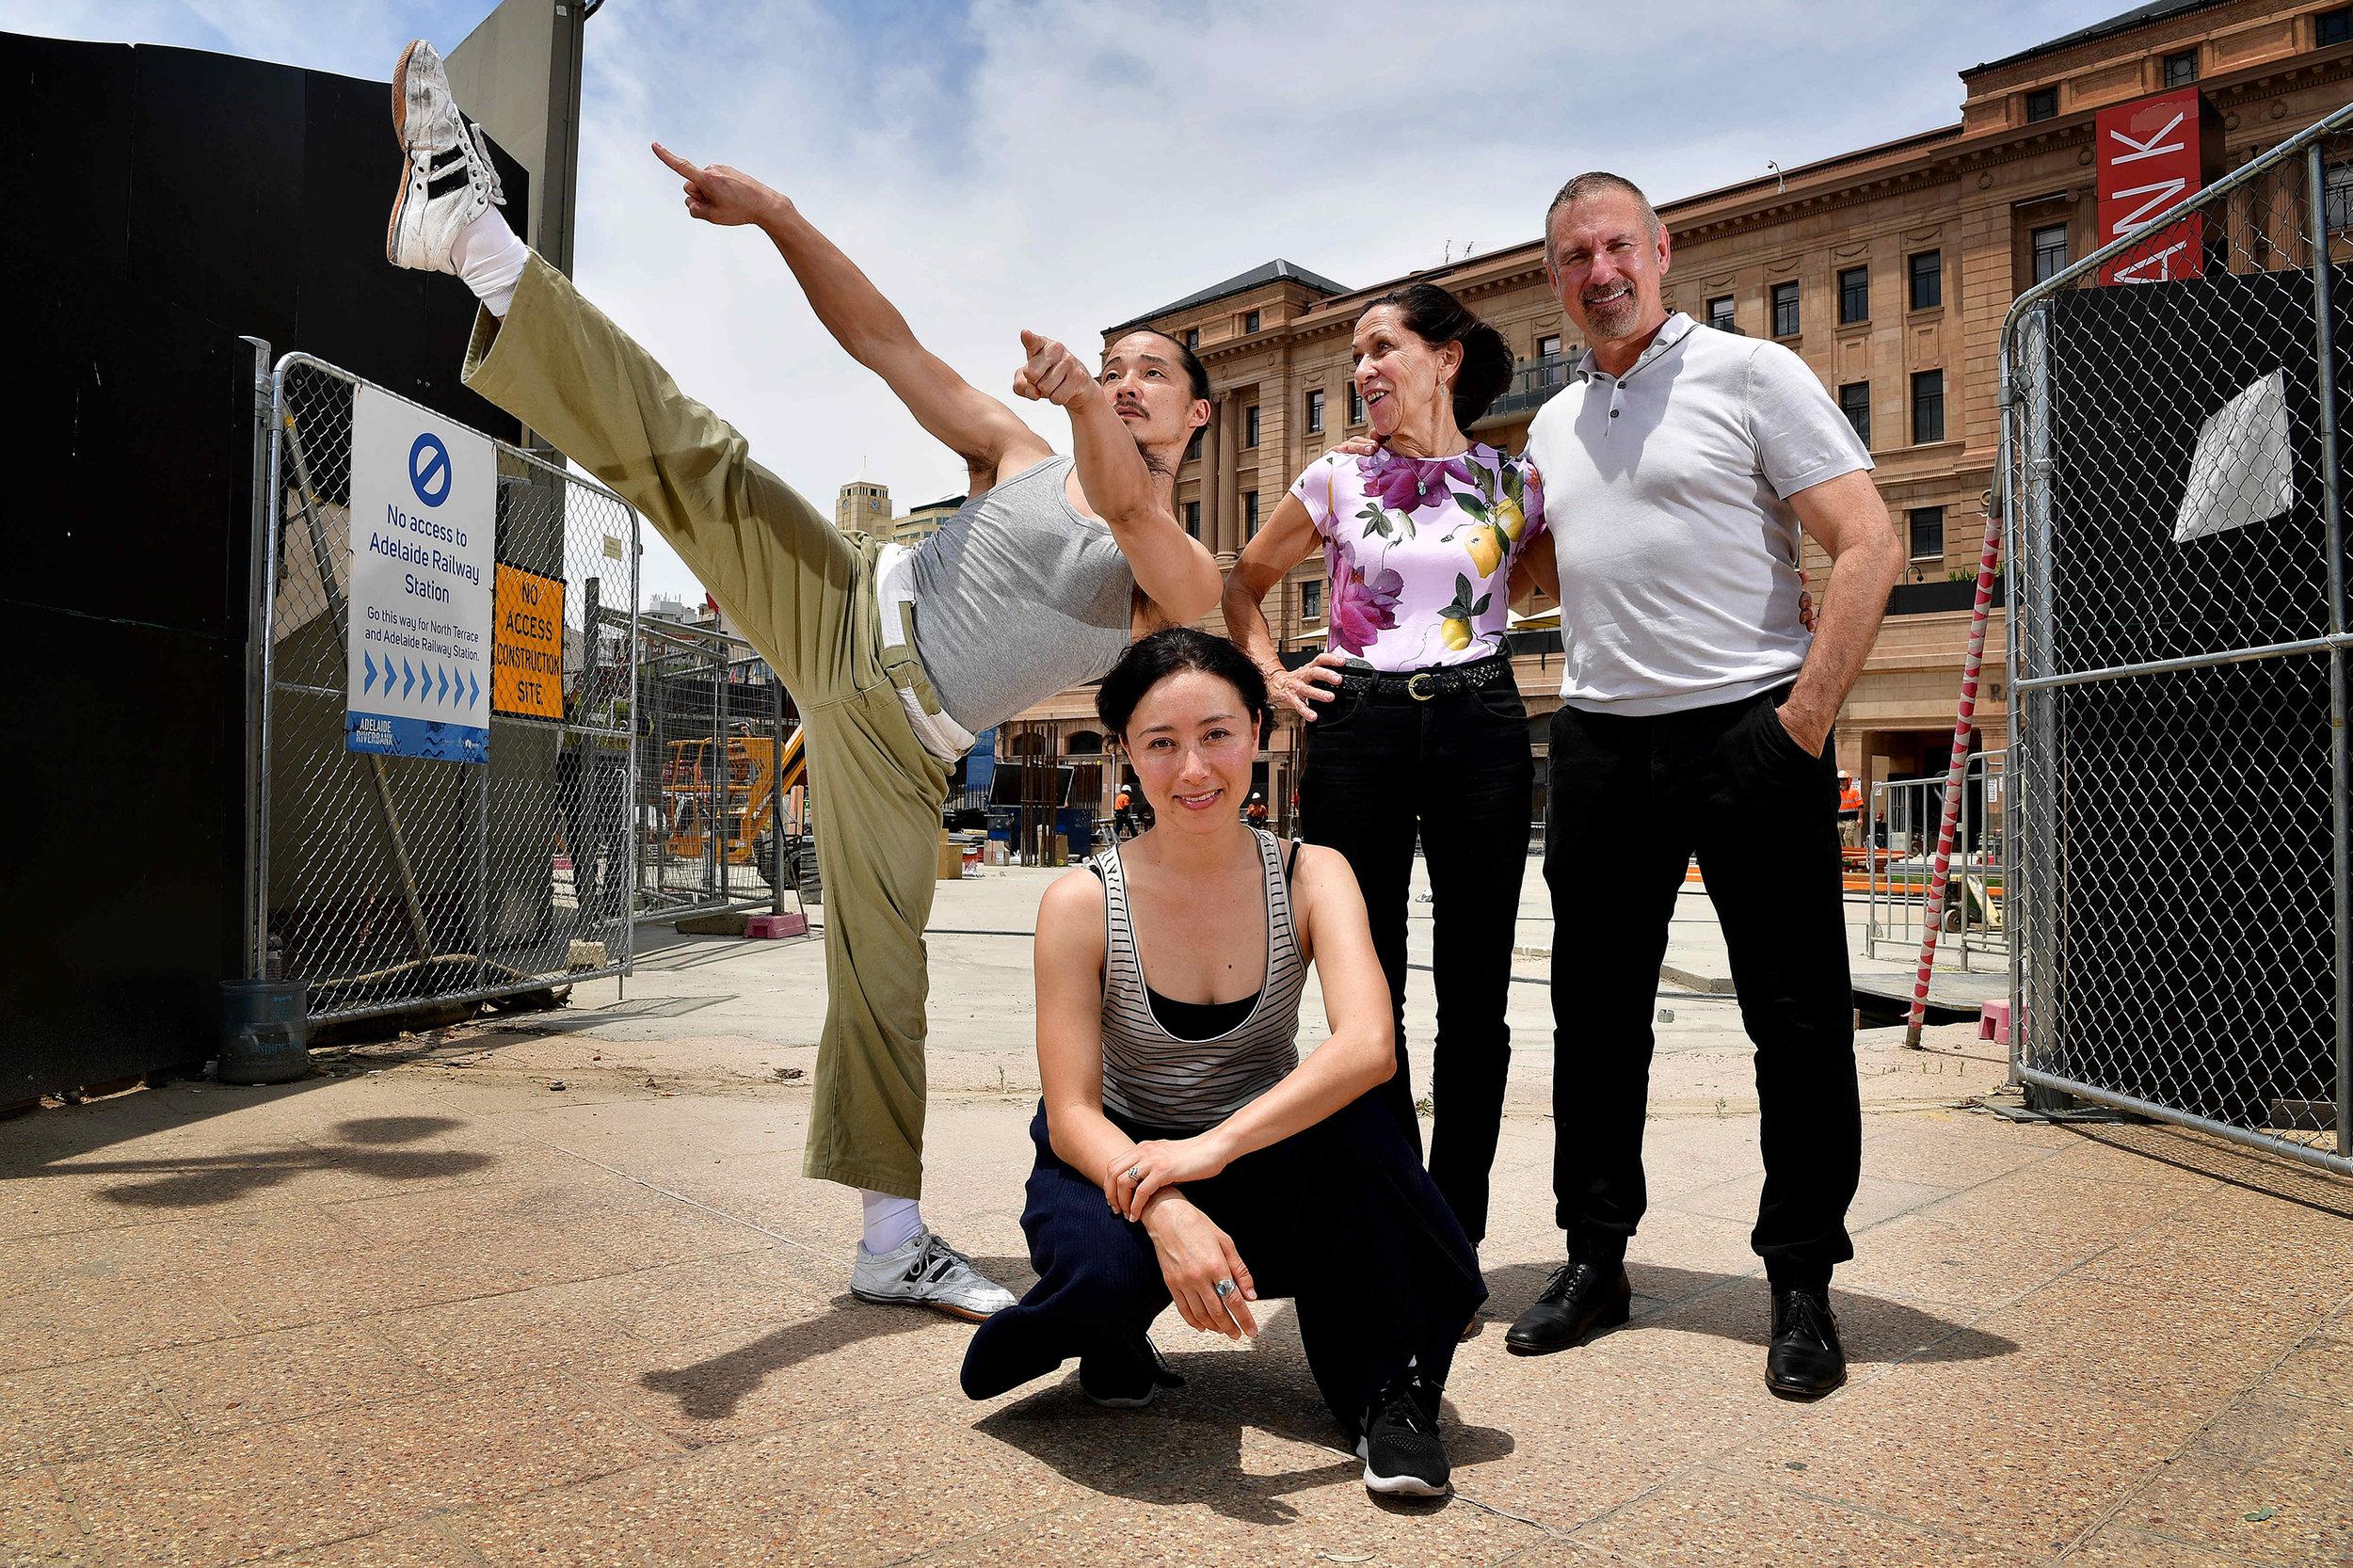 CHP_Export_168853438_Kimball Wong 'Construct' dancer Kristina Chan Remount director Gerlinde Liedtke.jpg